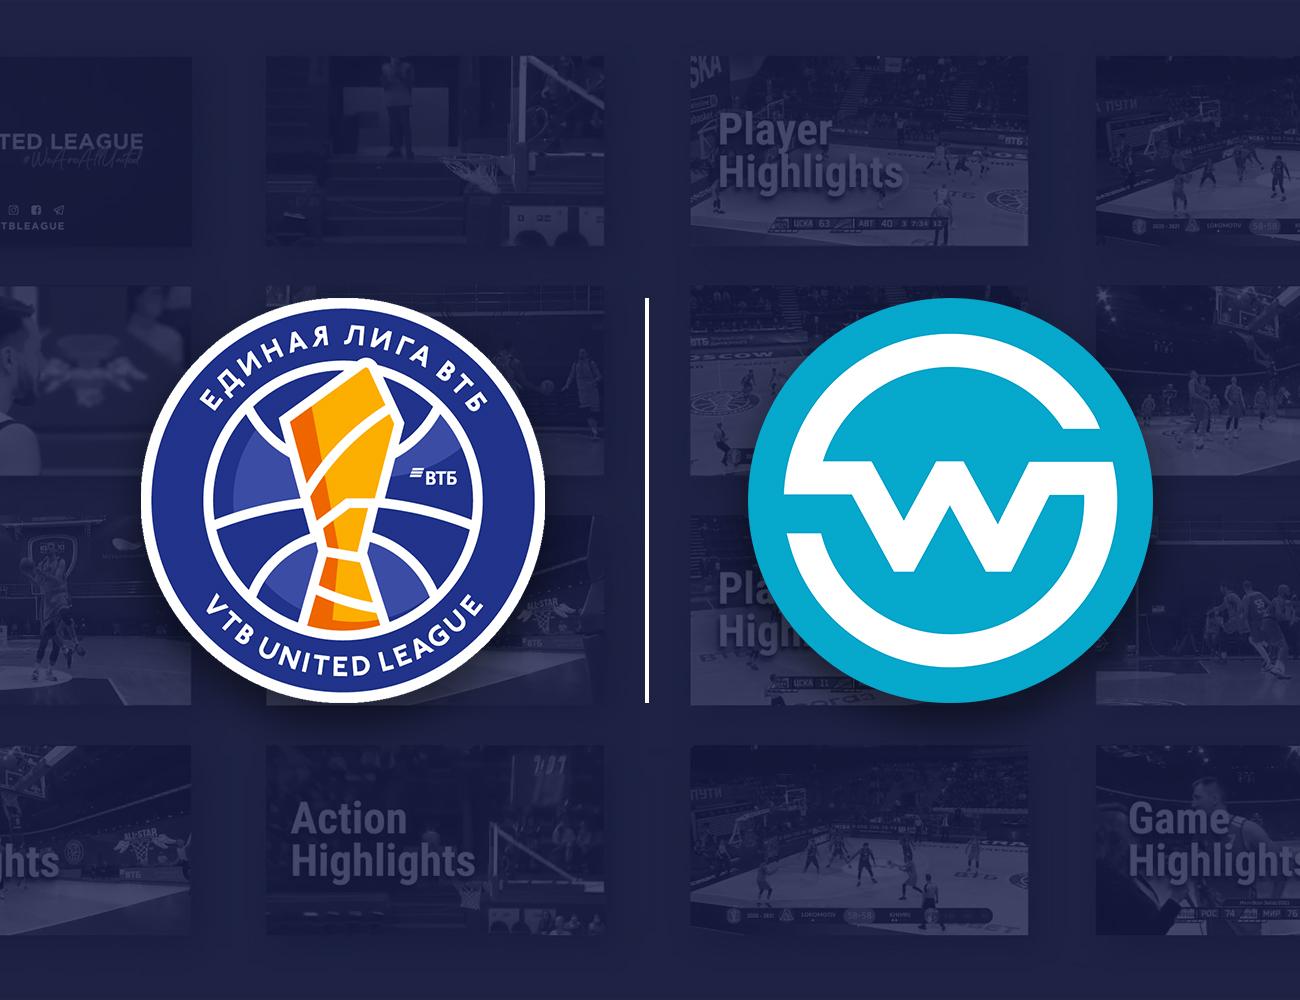 VTB United League announces partnership with WSC Sports